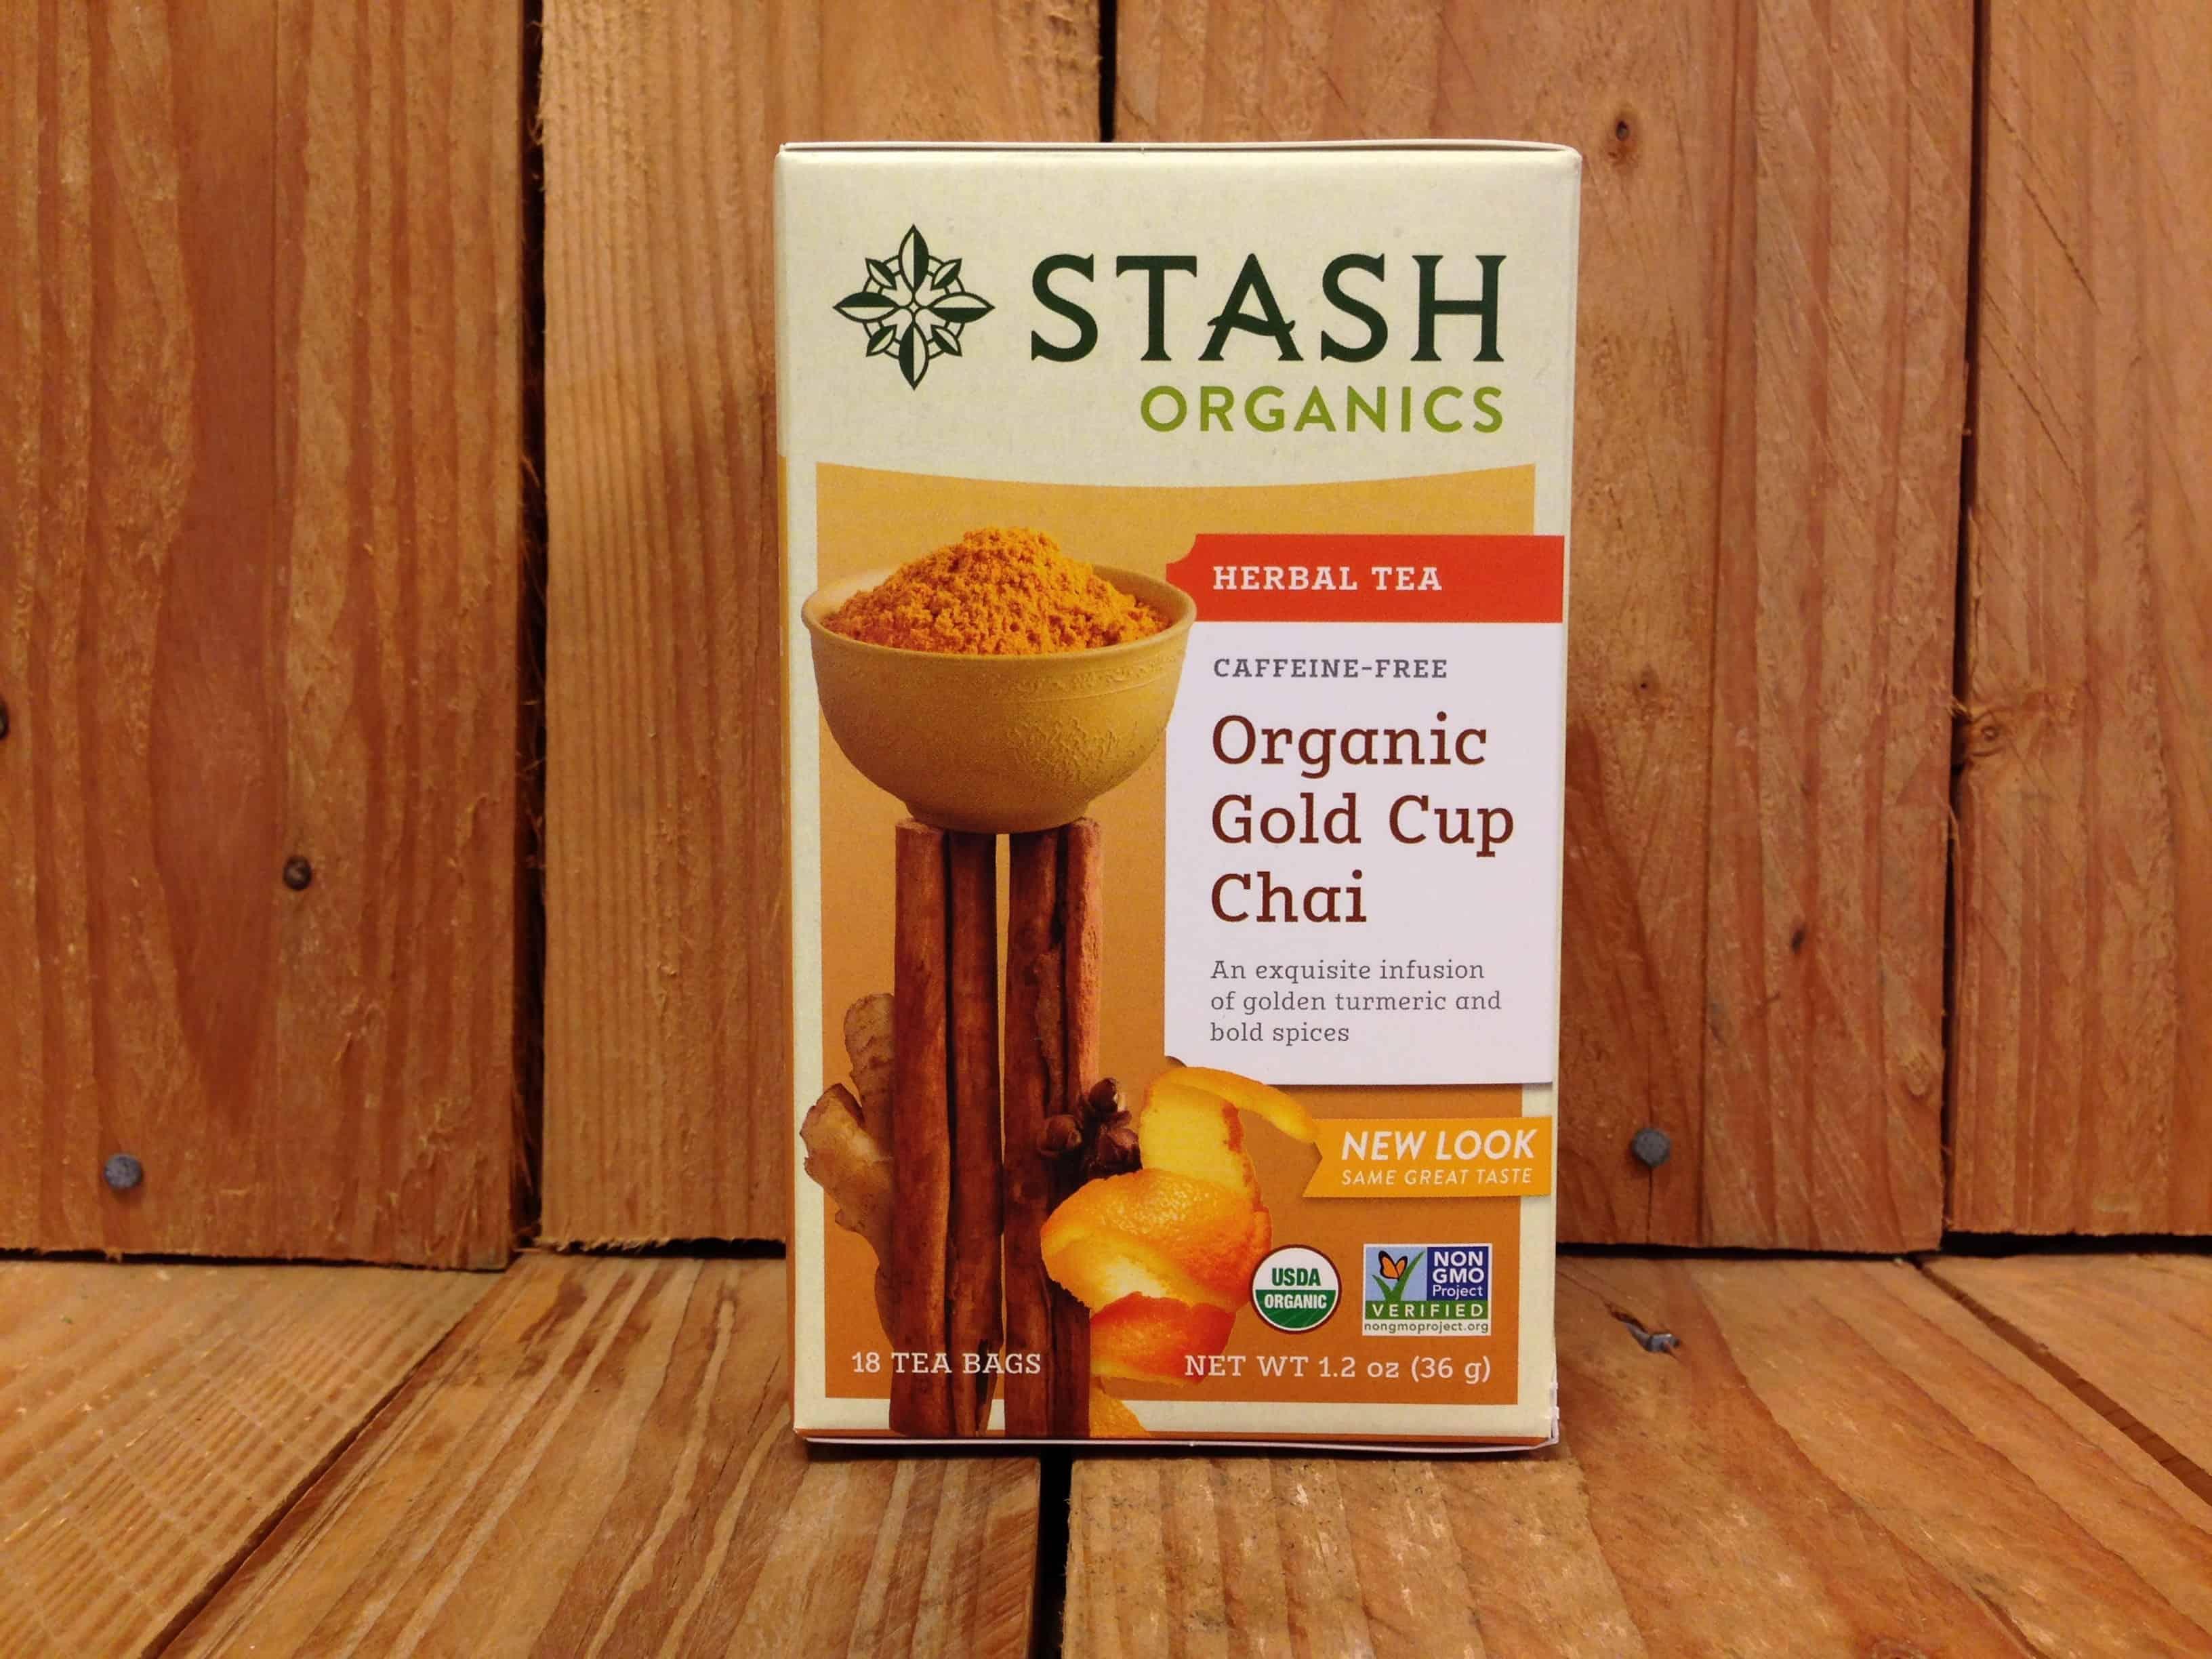 Stash Tea – Gold Cup Chai Herbal Tea (18 Bags)